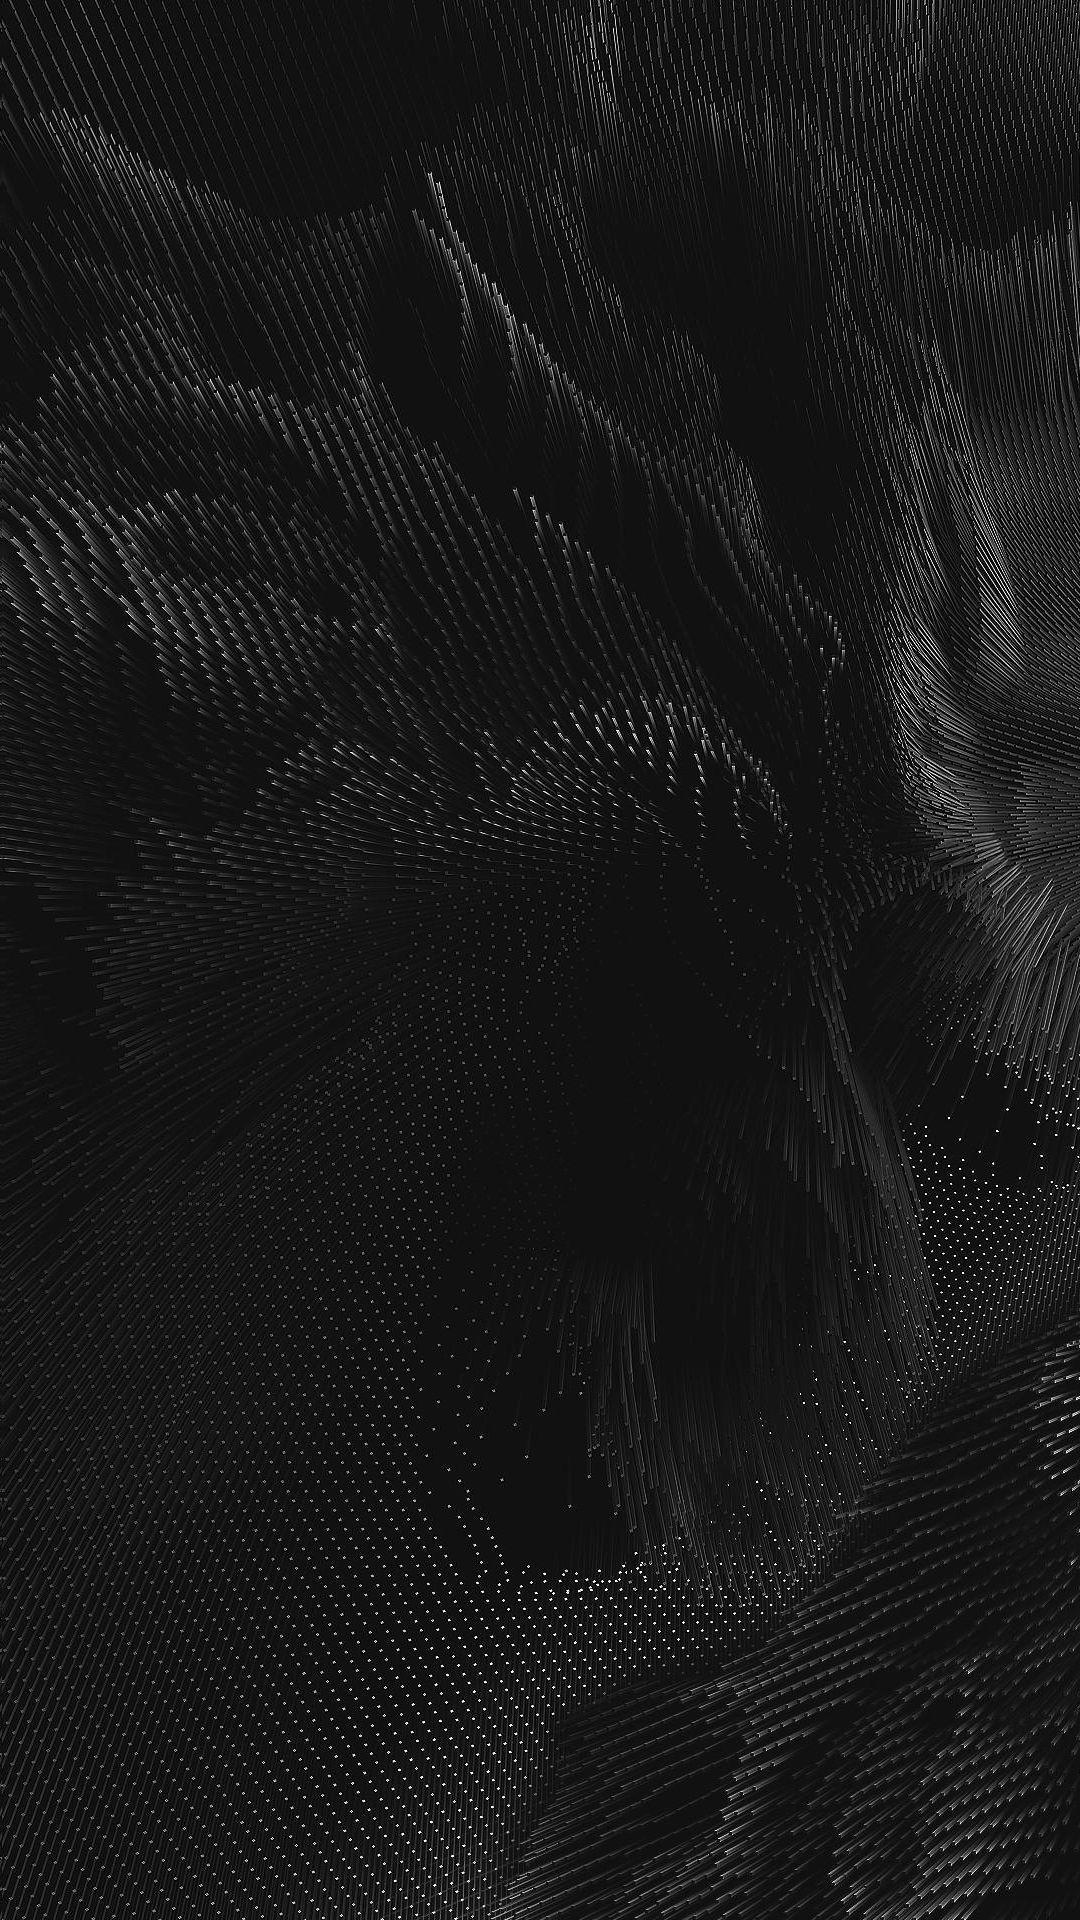 Dark Iphone Wallpaper Inspirational Hd Black Wallpaper Iphone X